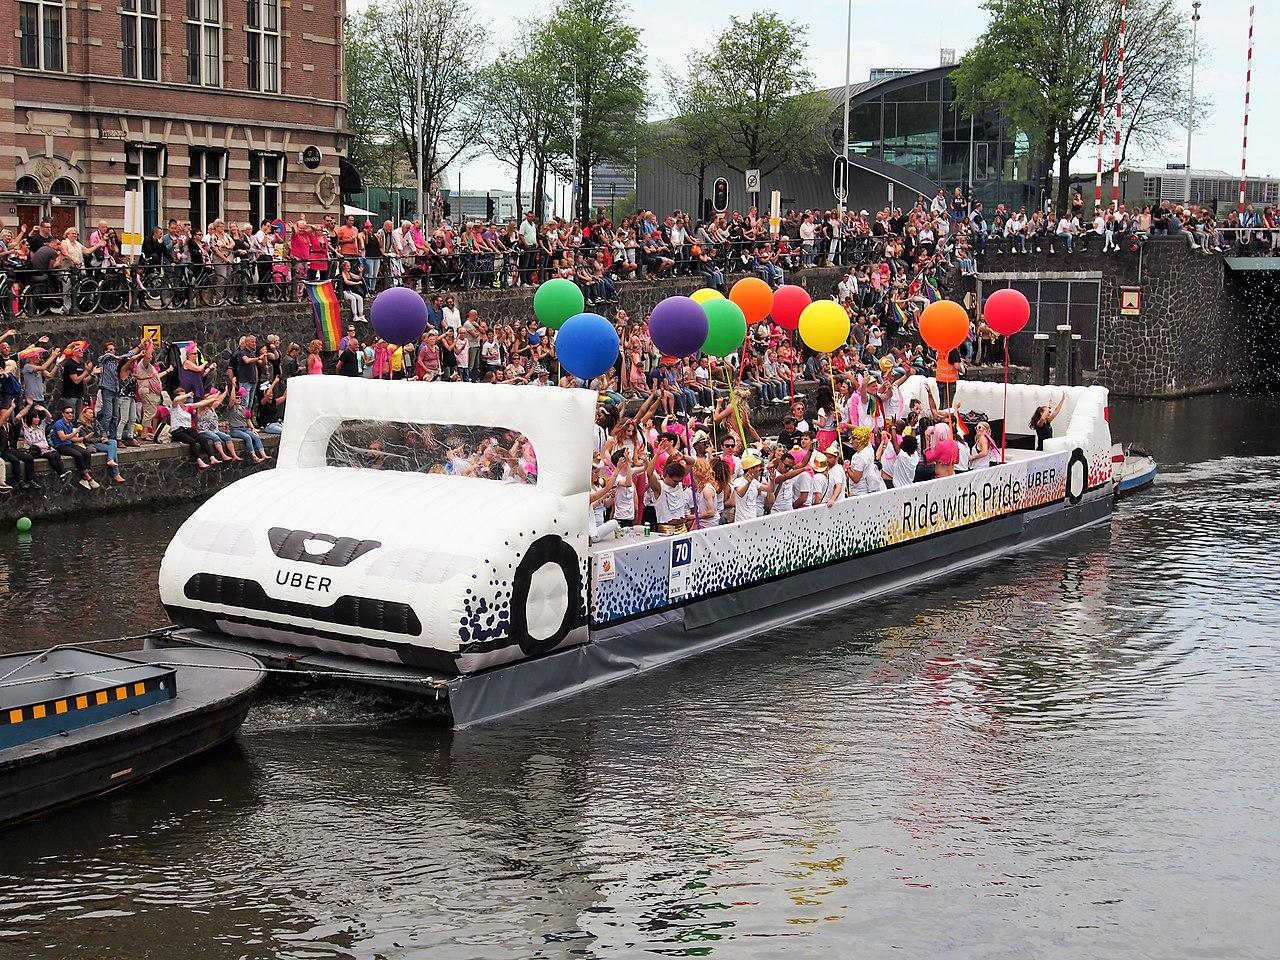 File:Boat 70 Uber, Canal Parade Amsterdam 2017 foto 1 JPG